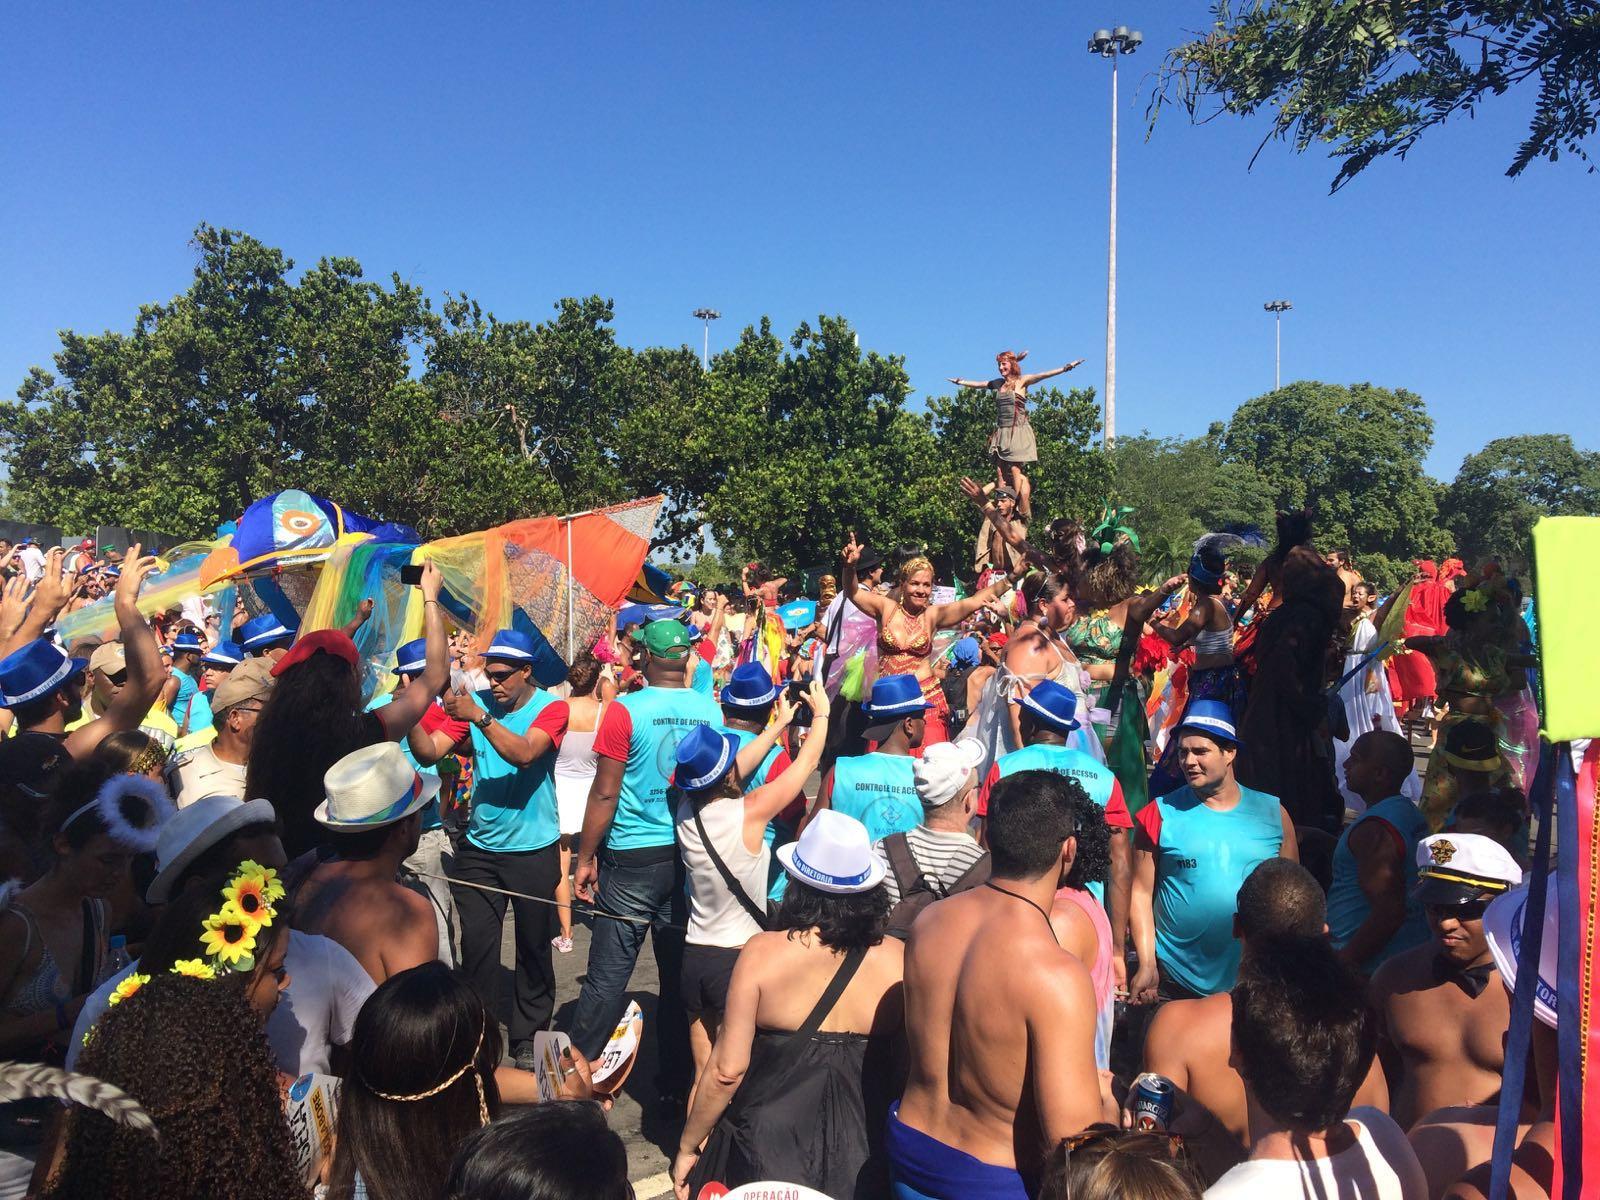 Orquestra Voadora: multidão colorida no Aterro